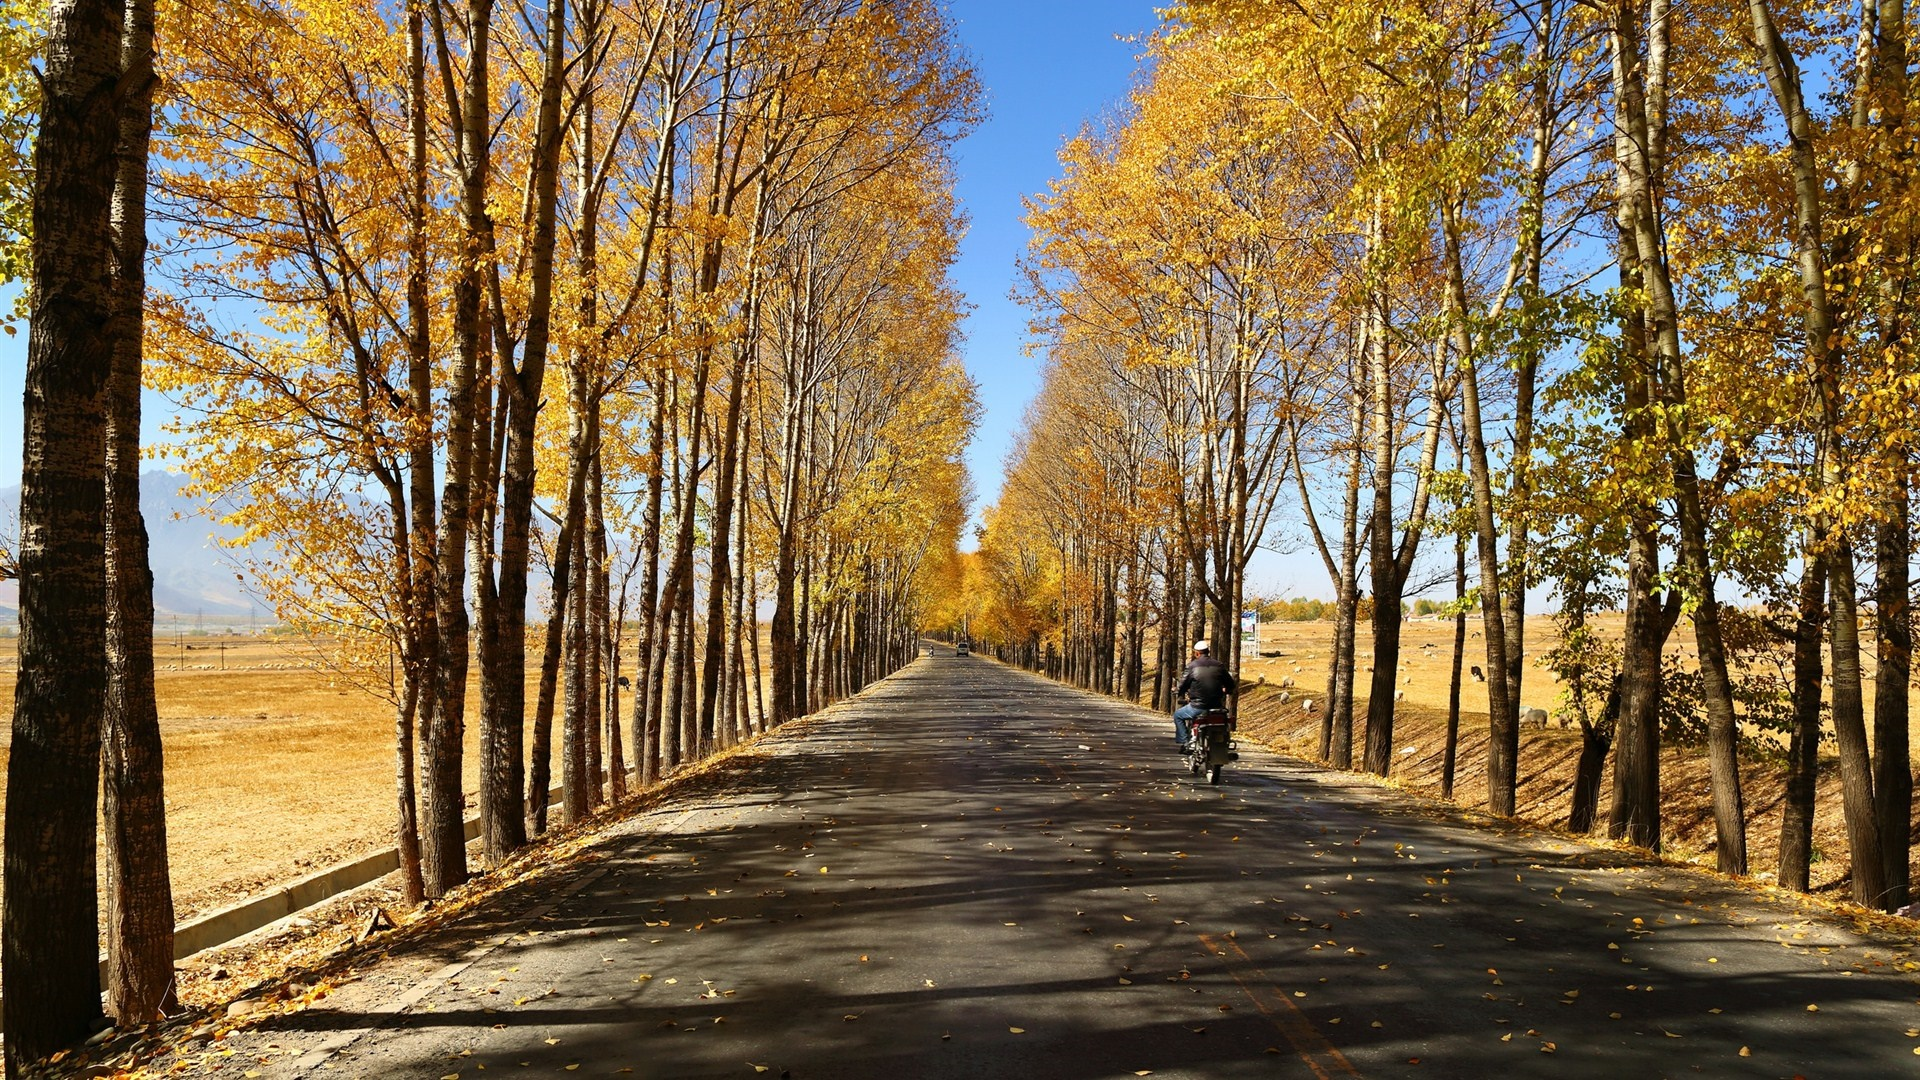 Gansu Corridor tree lane at fall wallpaper